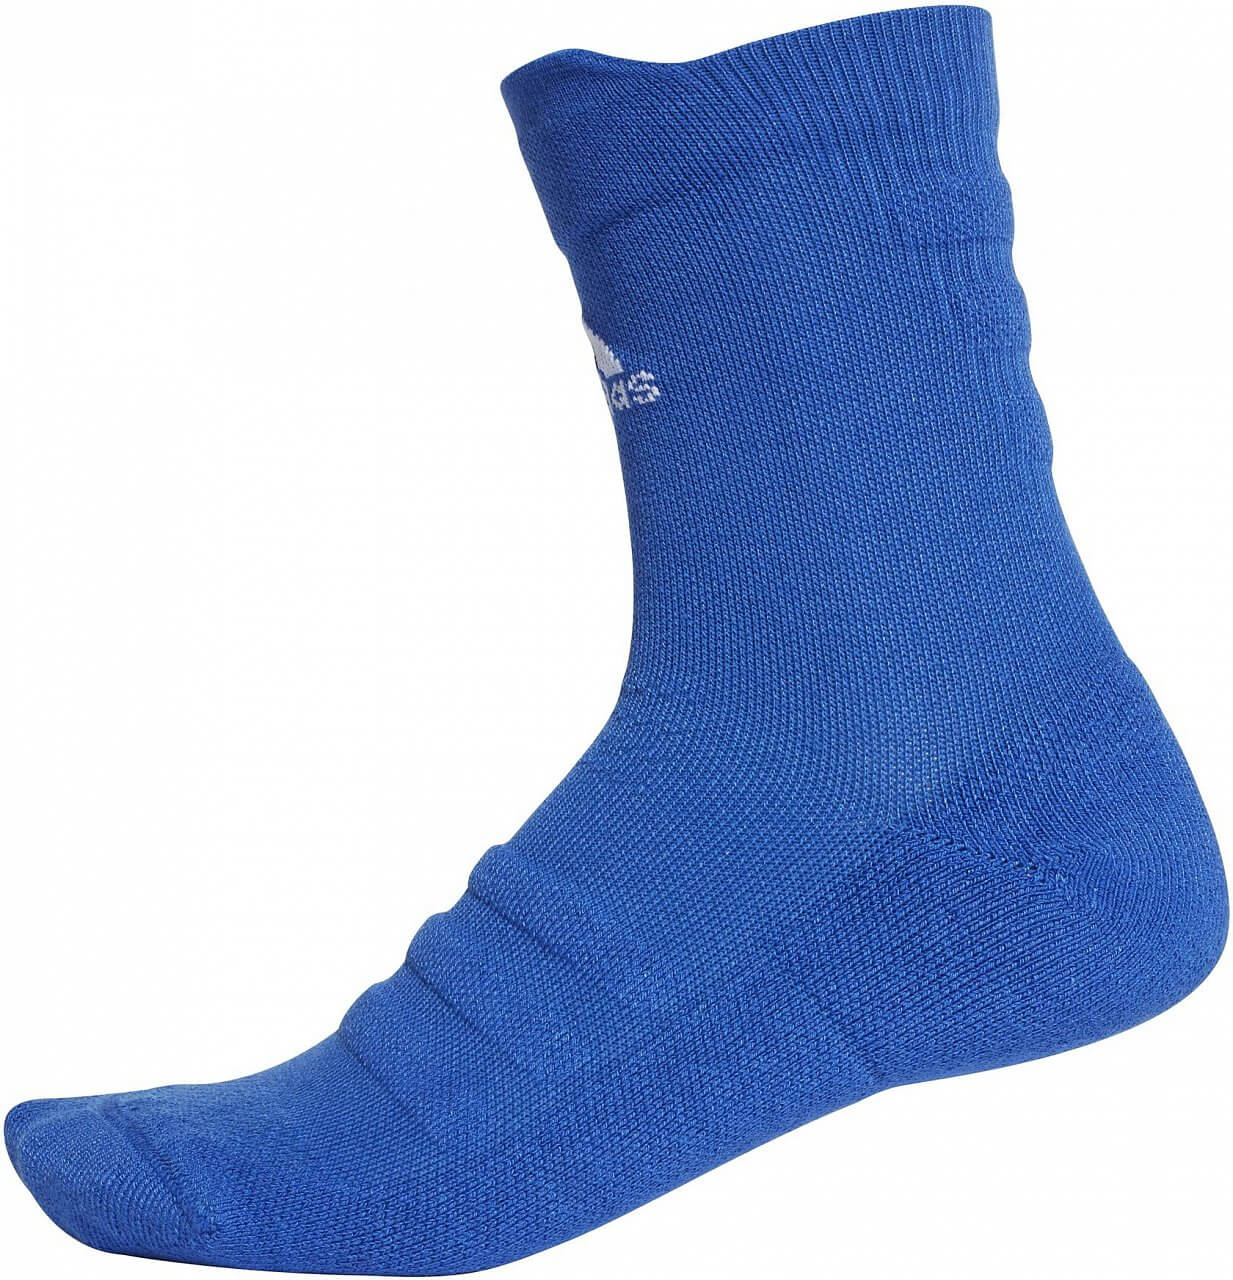 Sportovní ponožky adidas Alphaskin Crew Lightweight Cushioning